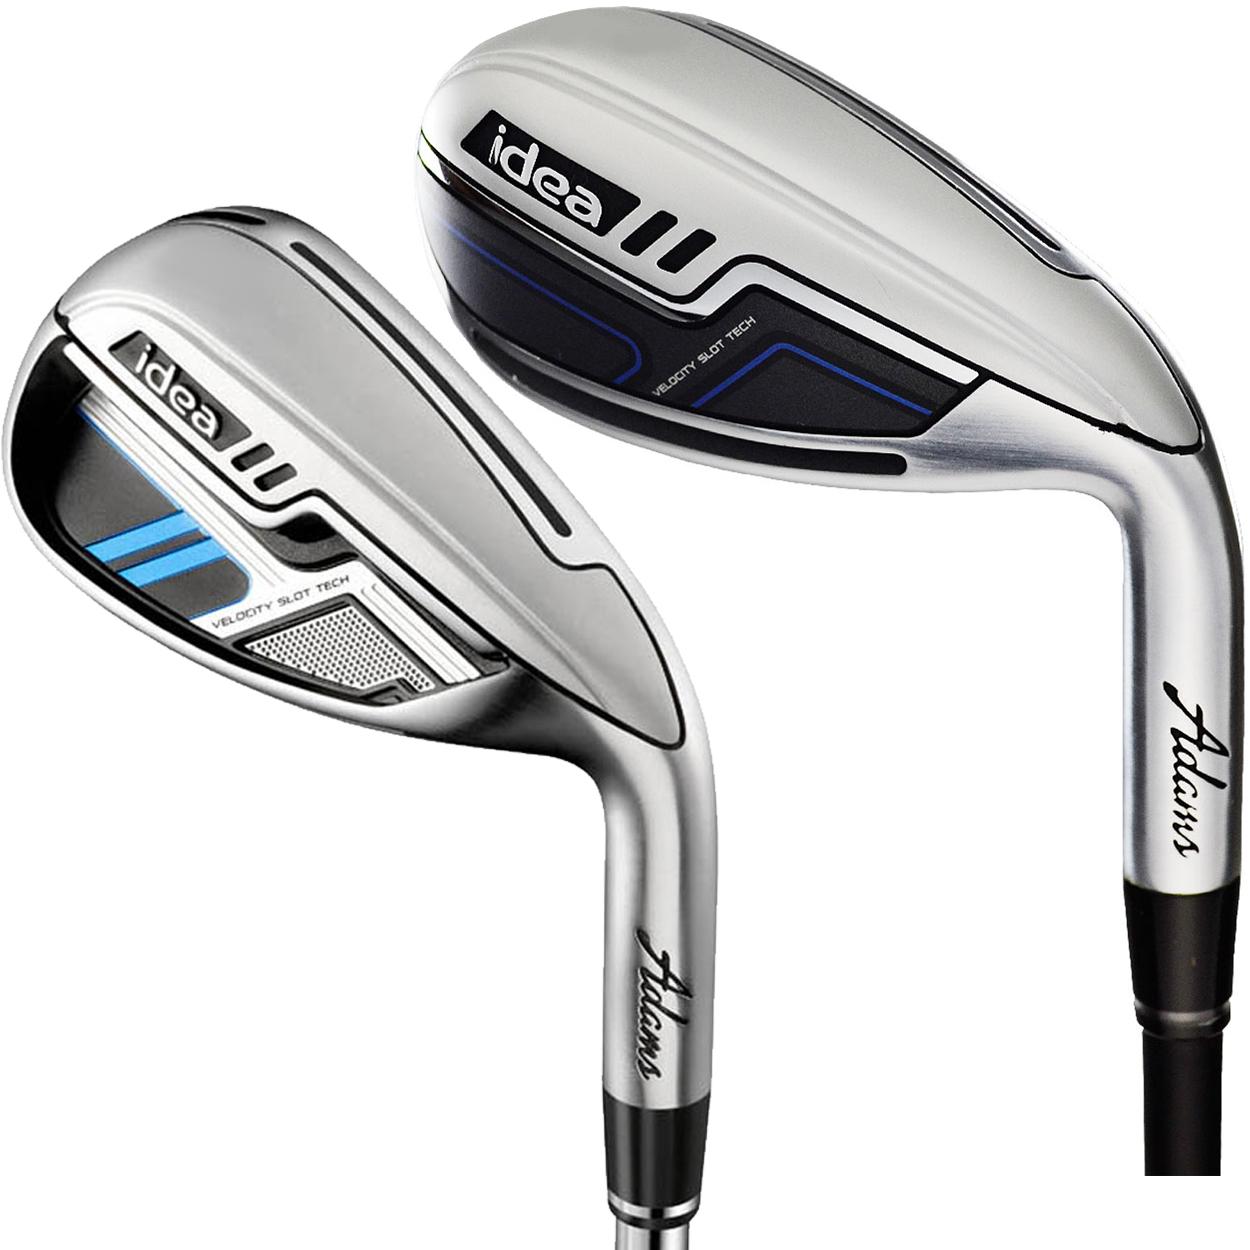 adams golf clubs new idea hybrid iron set 6 7t 8 pw. Black Bedroom Furniture Sets. Home Design Ideas